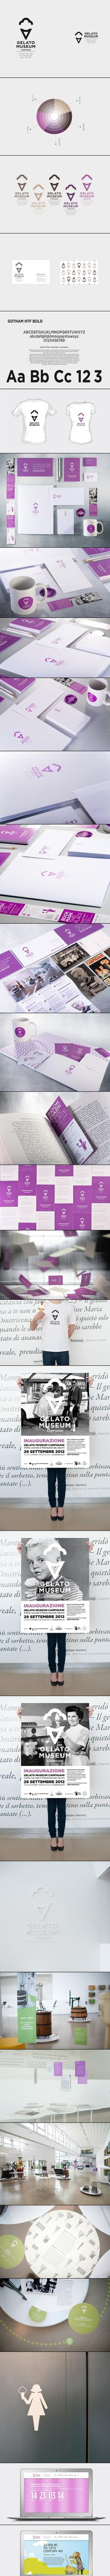 Gelato Museum #identity #packaging #branding #marketing PD